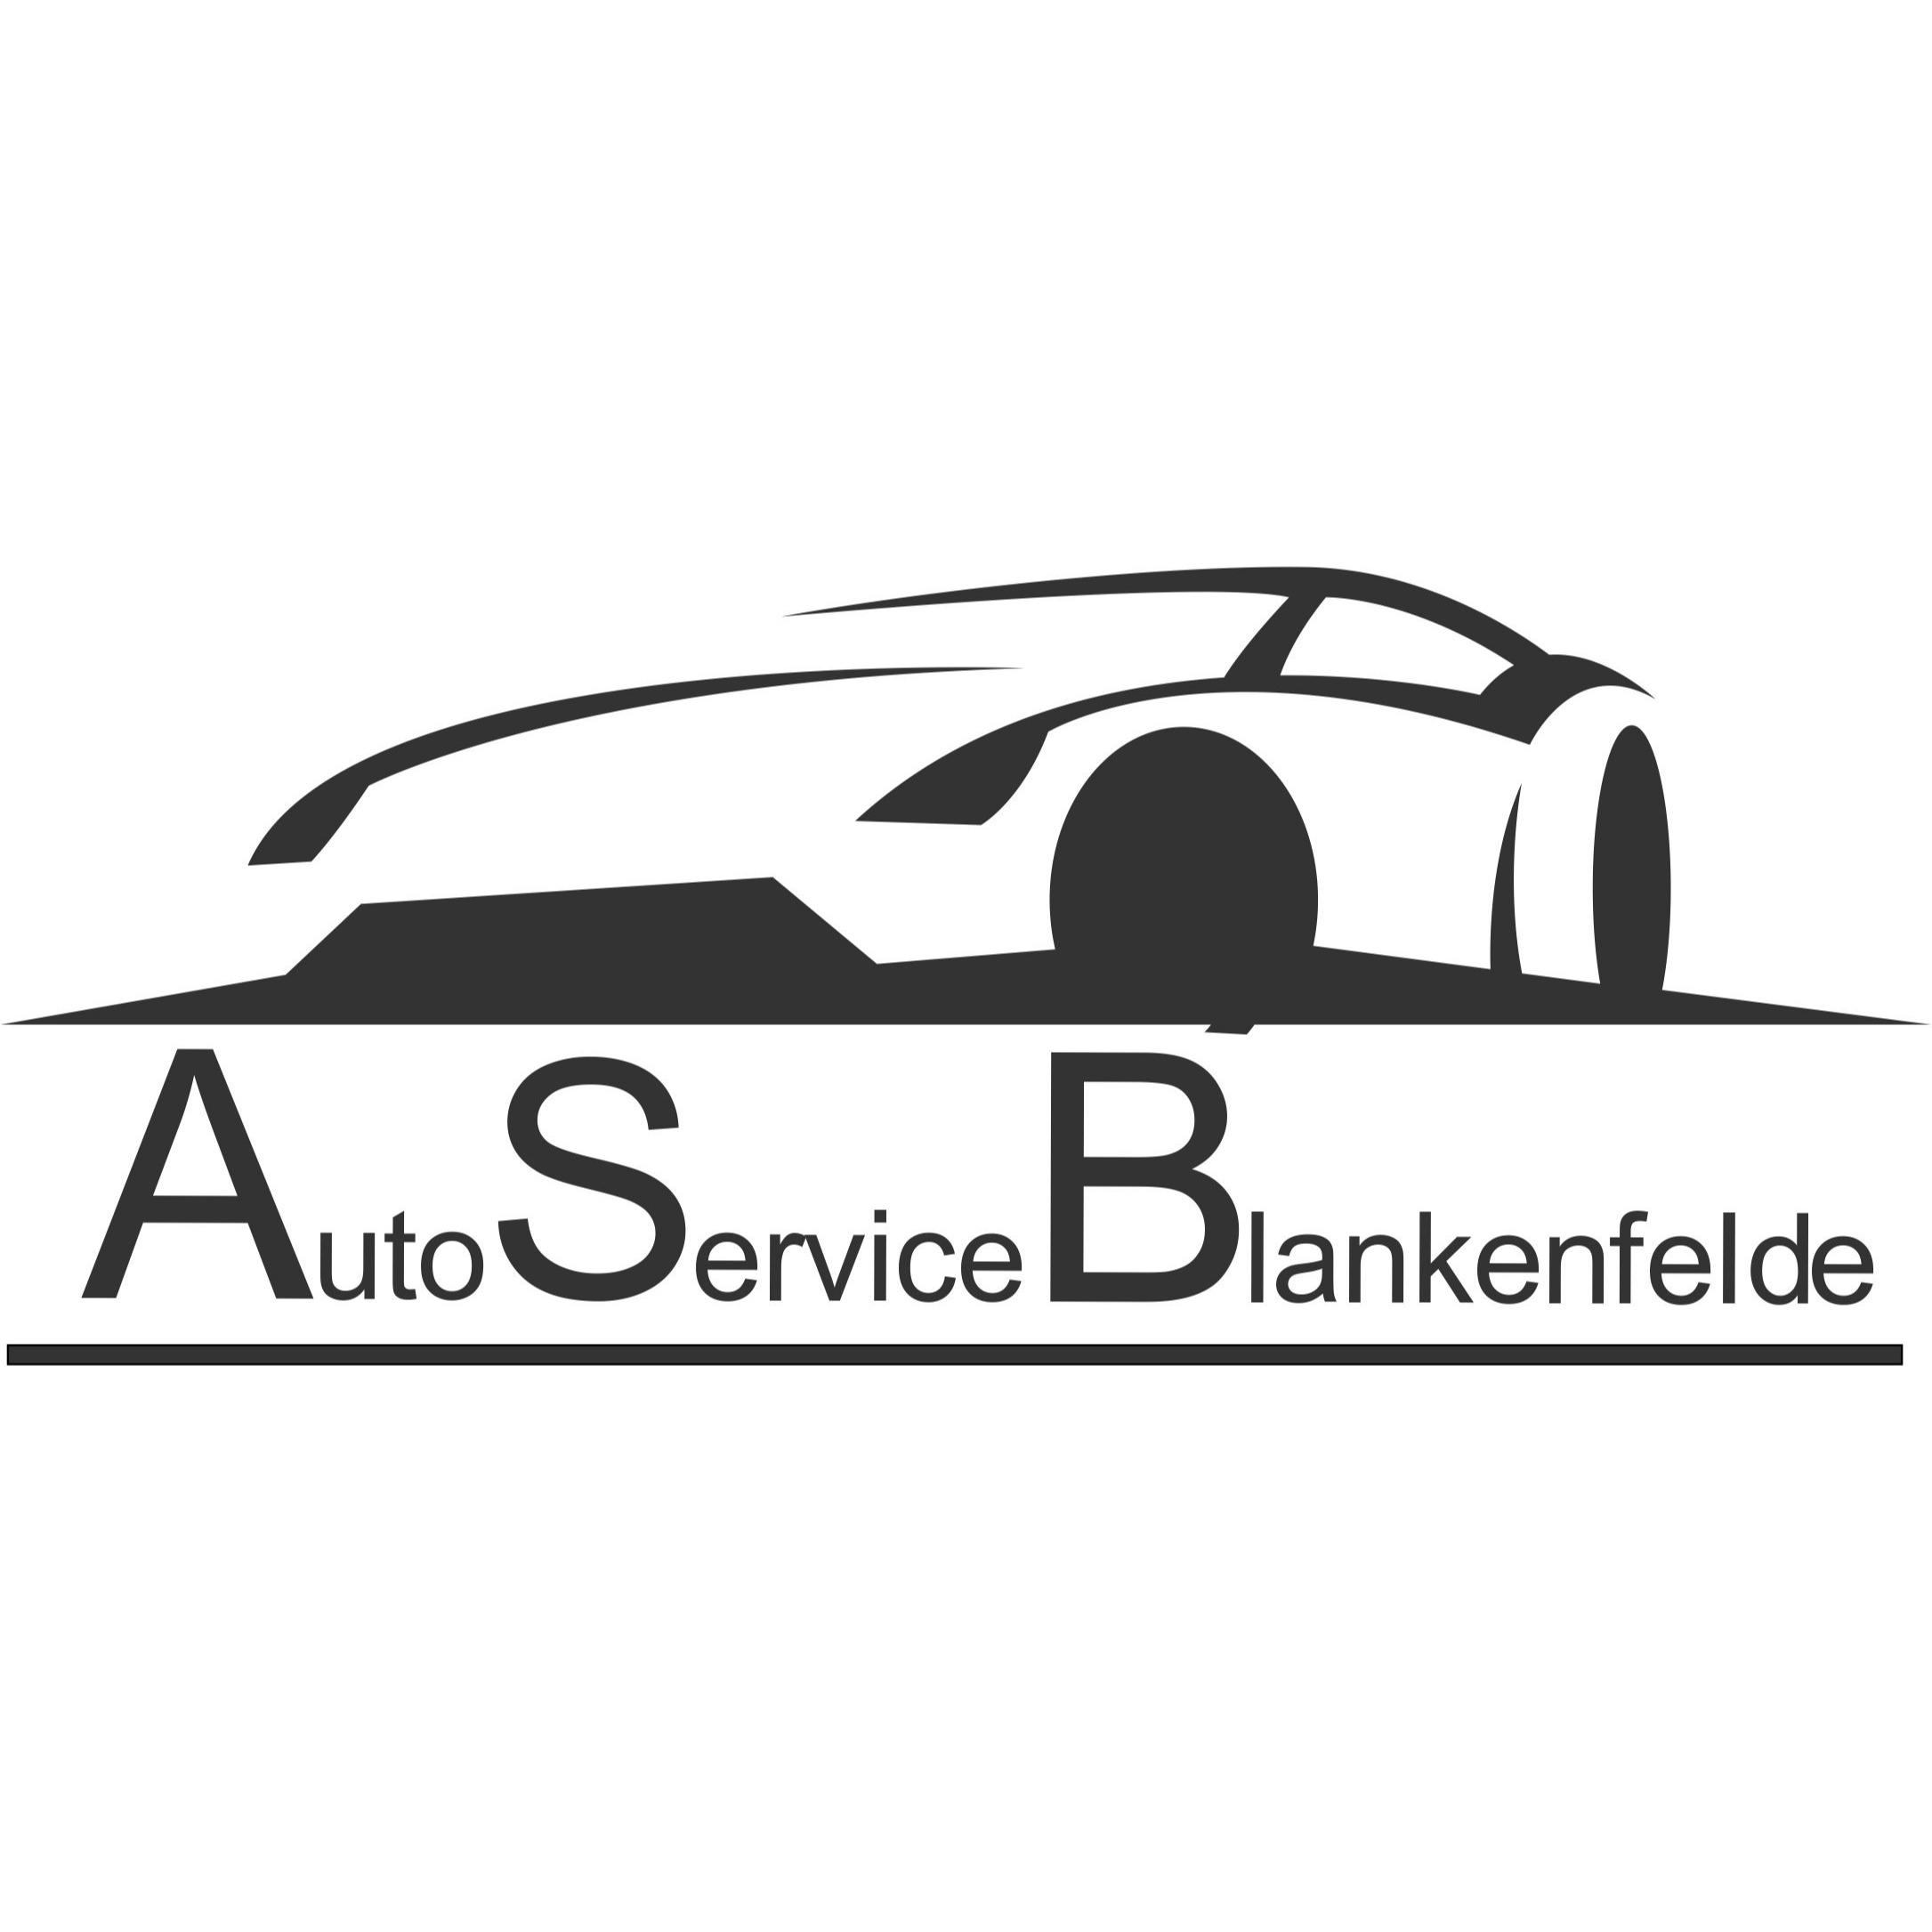 Bild zu Autoservice Blankenfelde in Blankenfelde Mahlow